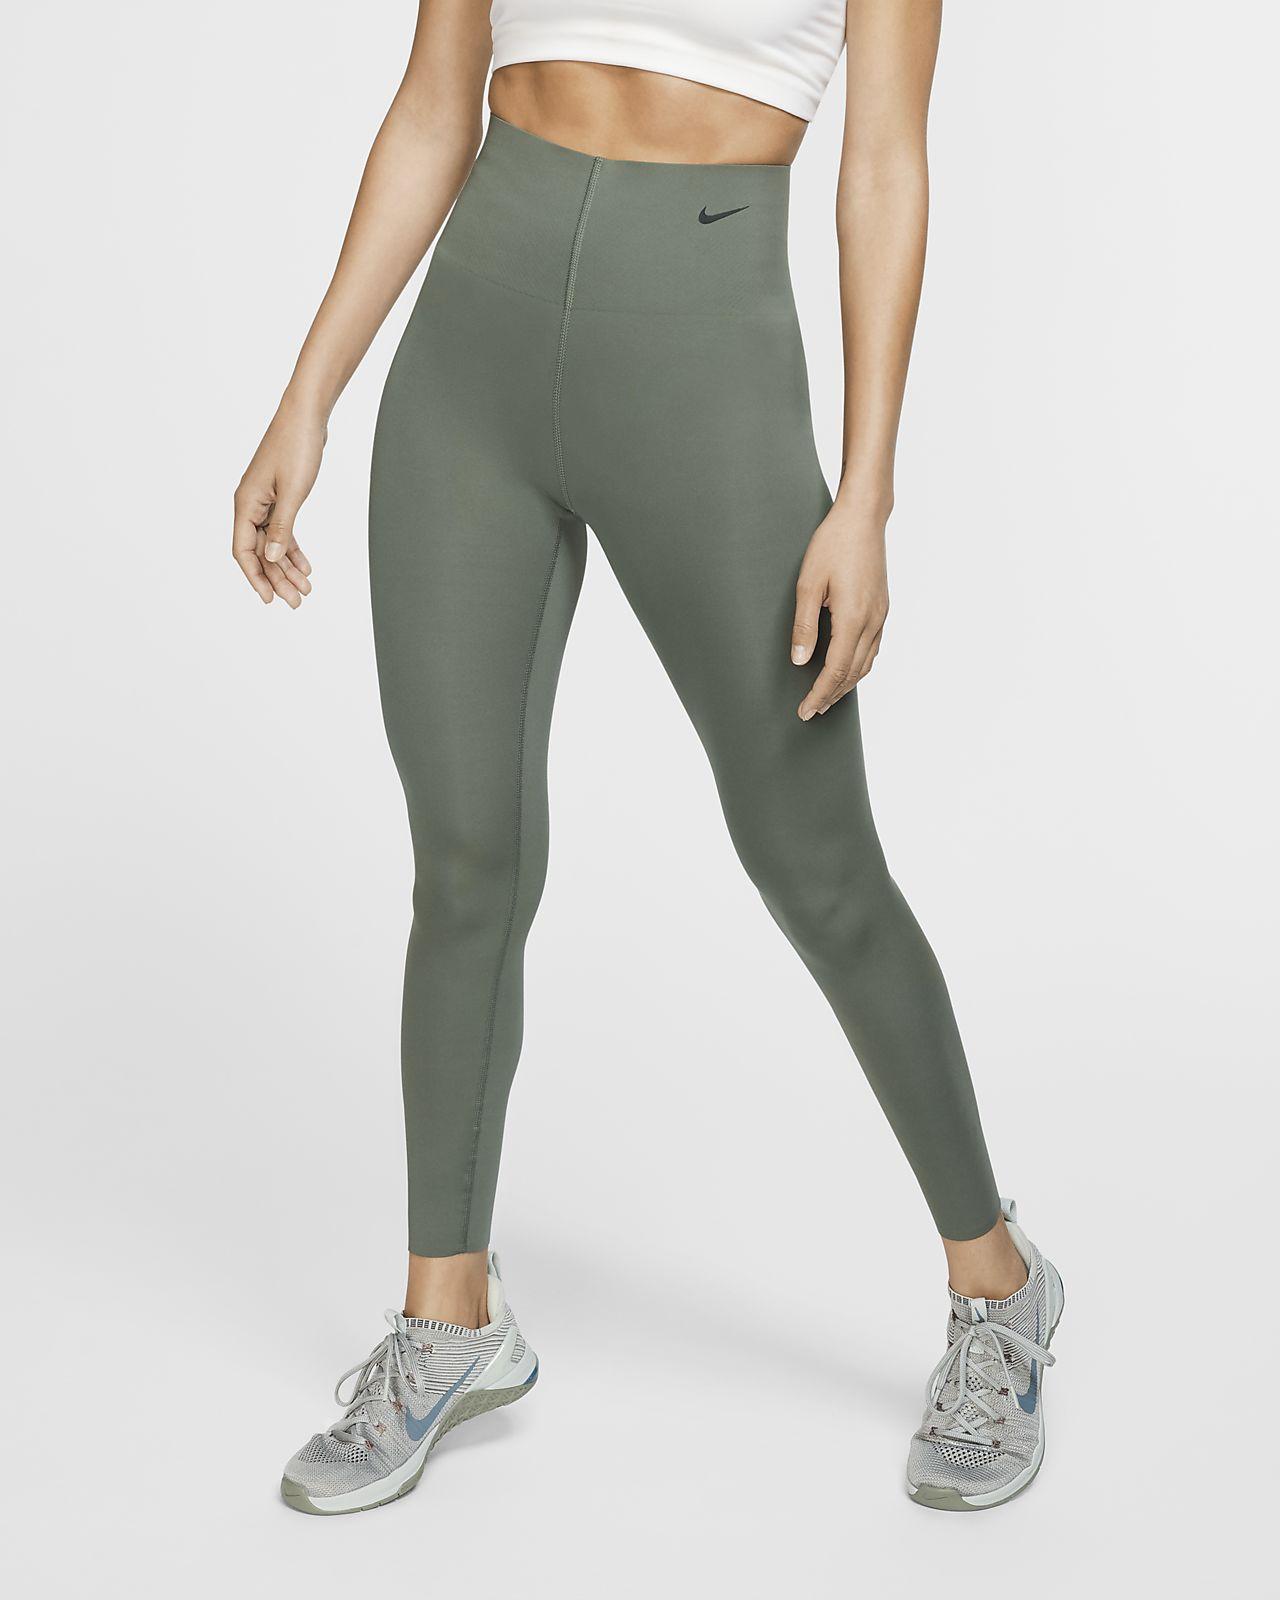 Nike Sculpt Lux Women's 7/8 Tights